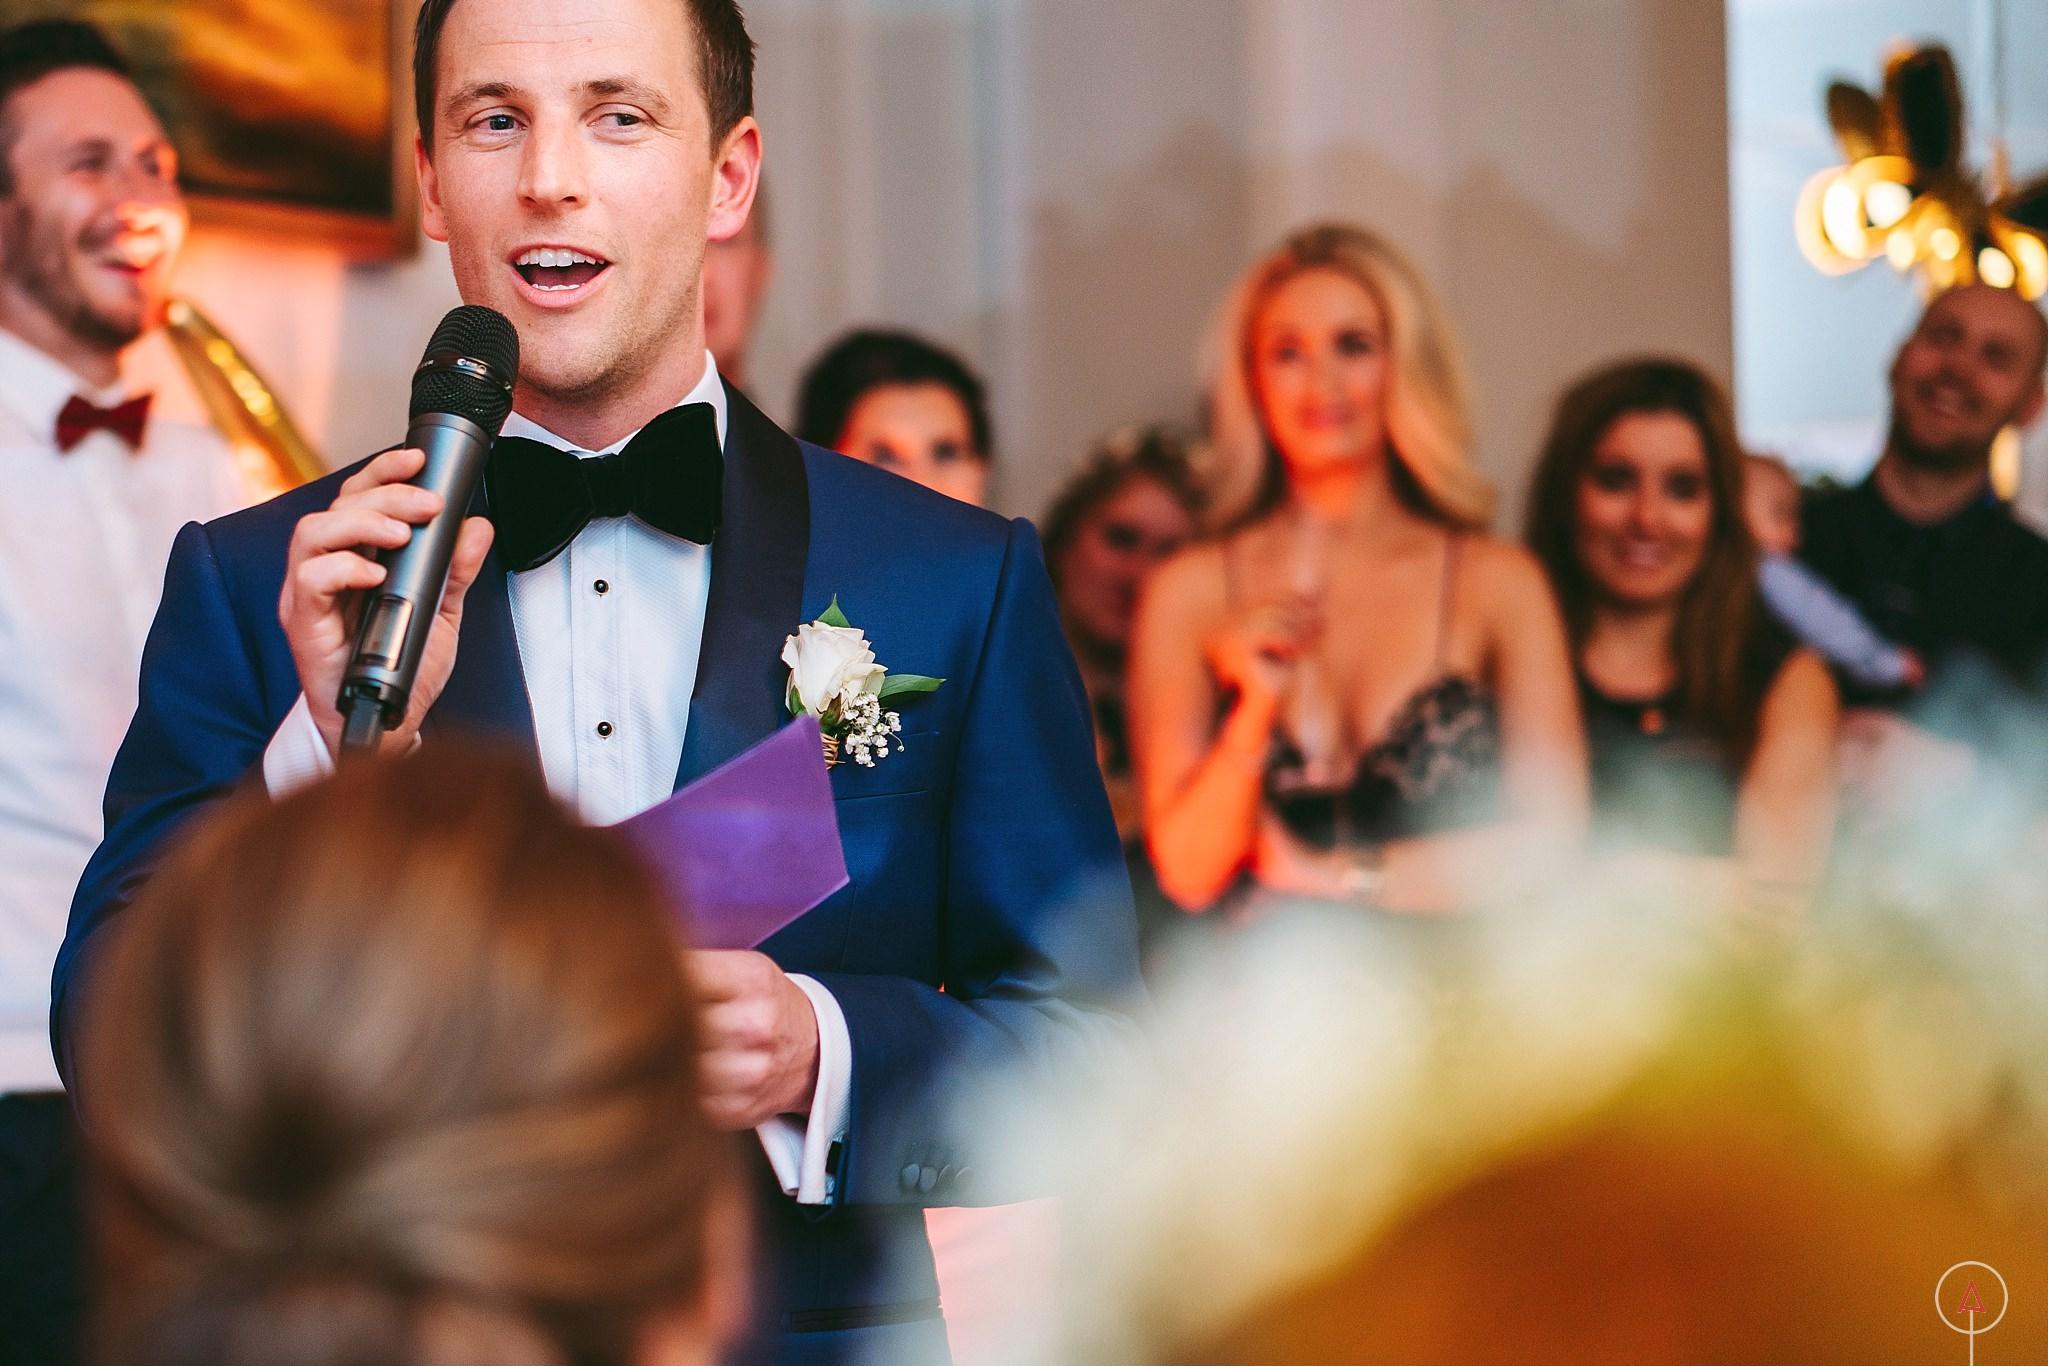 cardiff-wedding-photographer-aga-tomaszek_0303